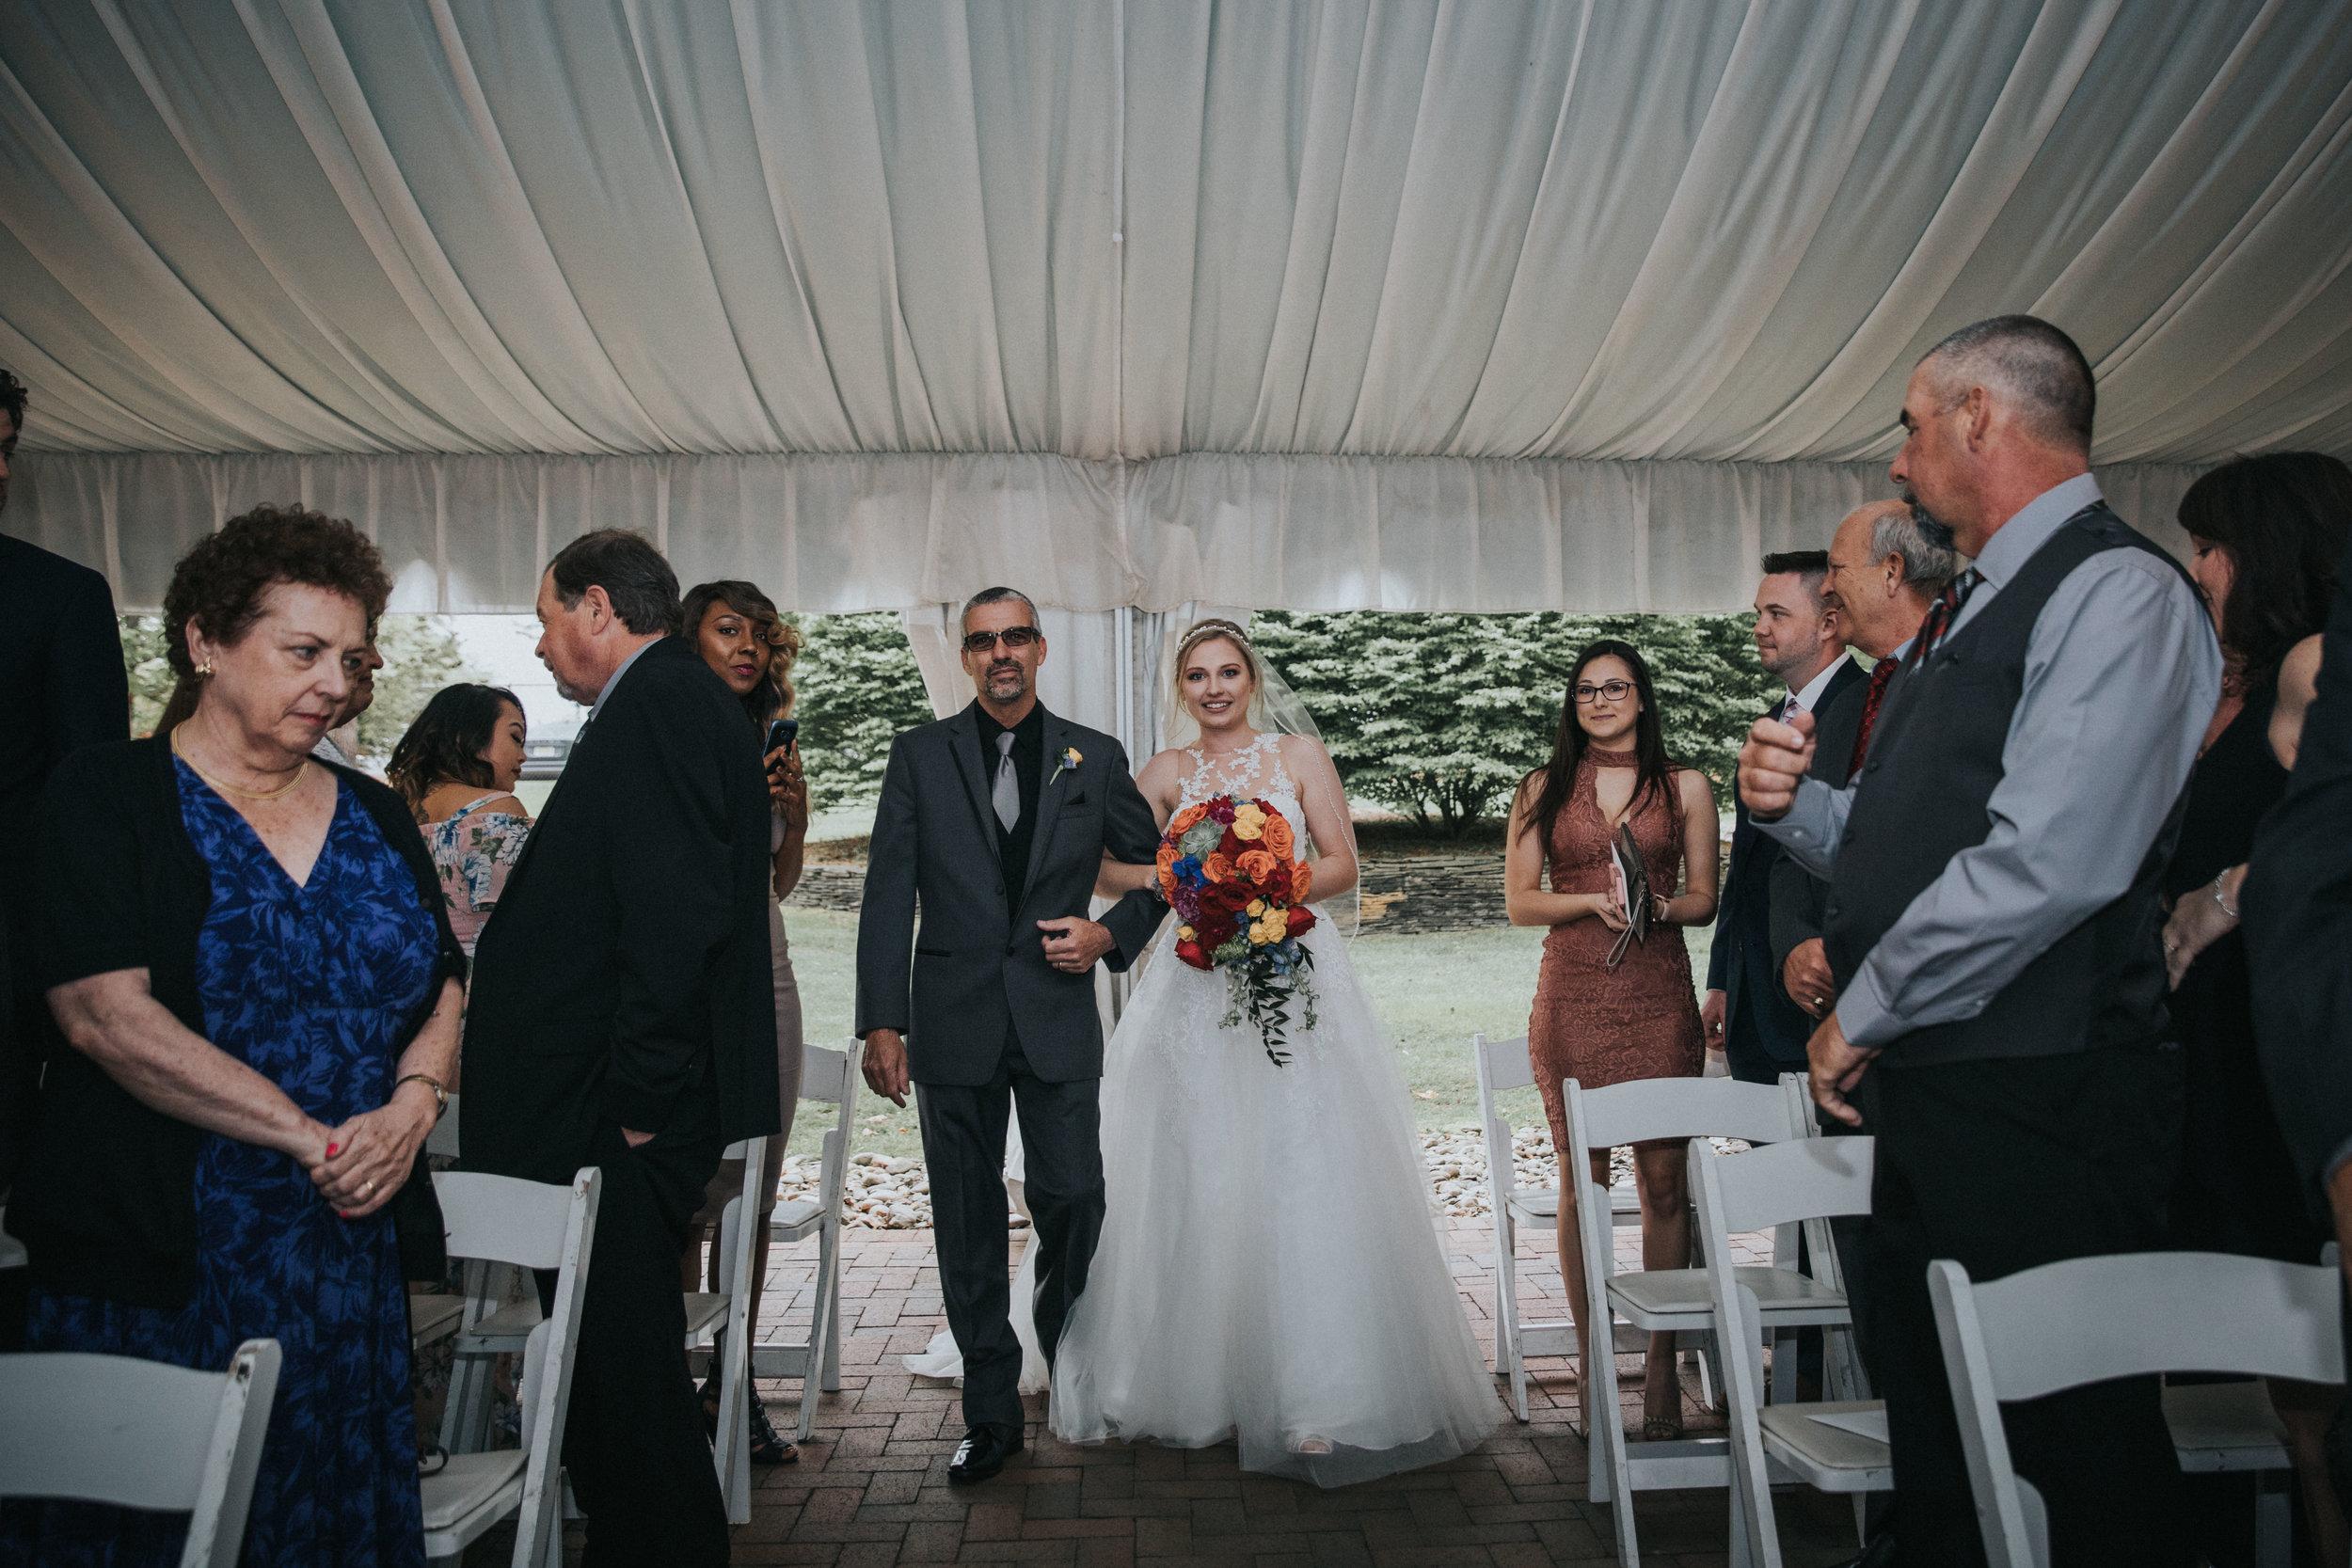 New-Jersey-Wedding-Photographer-Megan&Nick-Ceremony-72.jpg